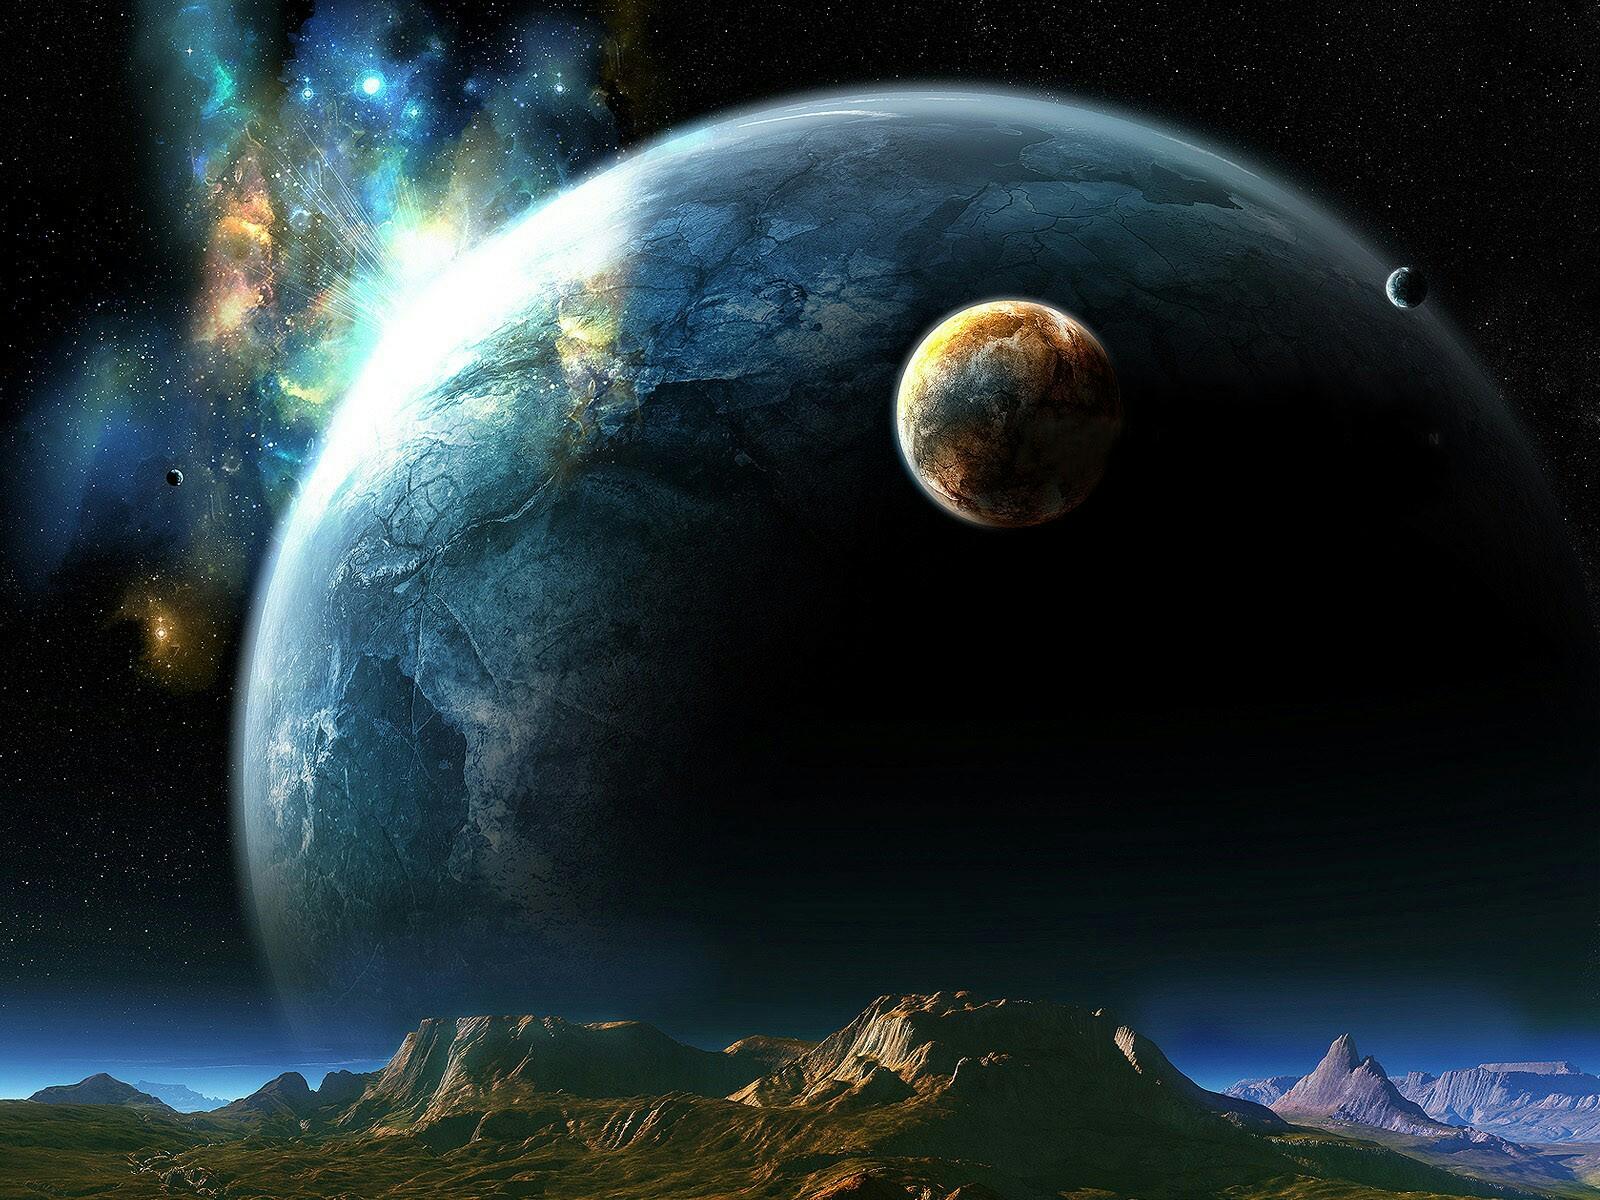 eefedca-space-hd-wallpaper-wp3801414